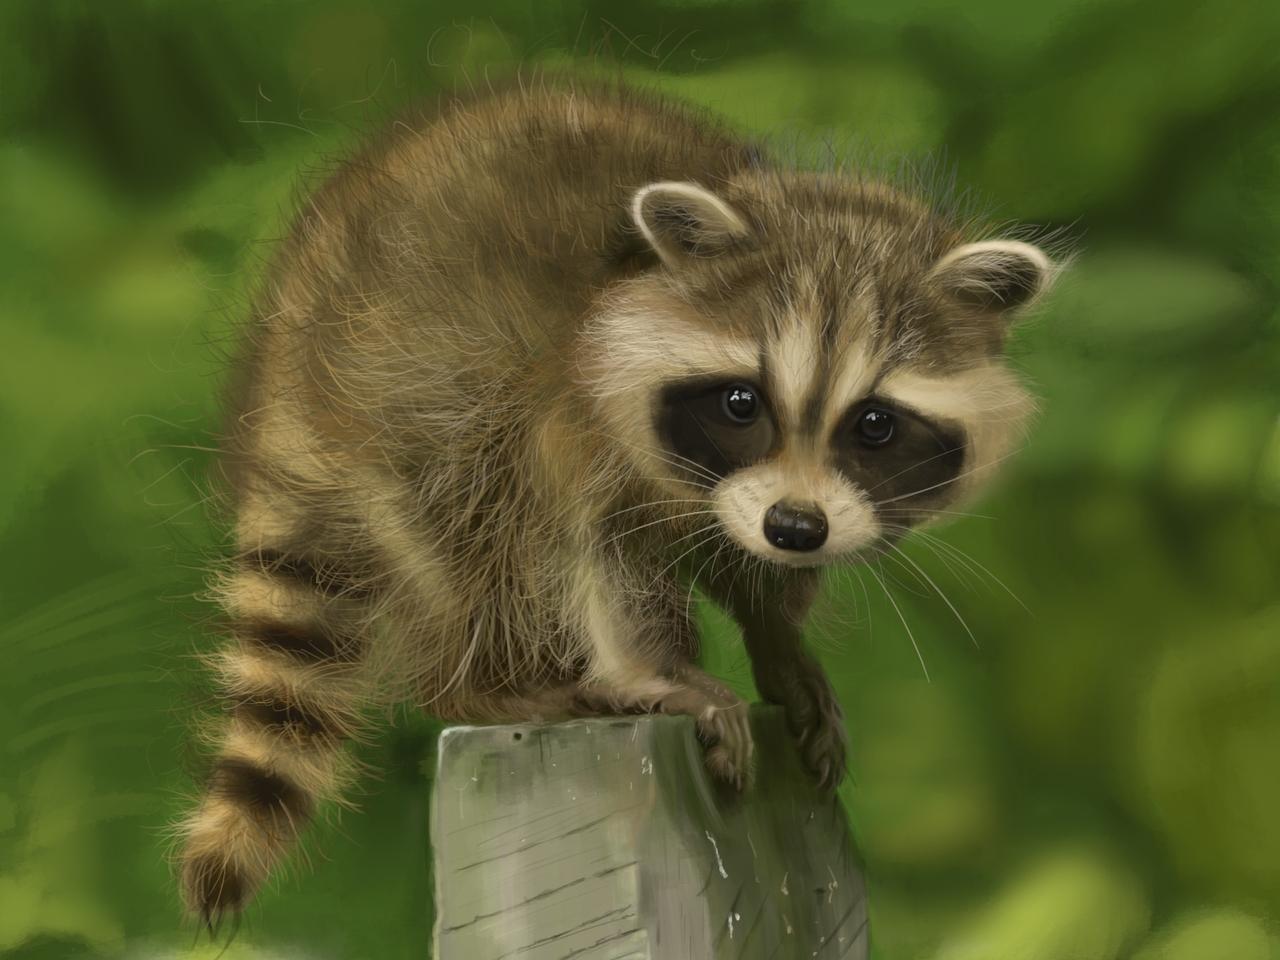 Baby Raccon